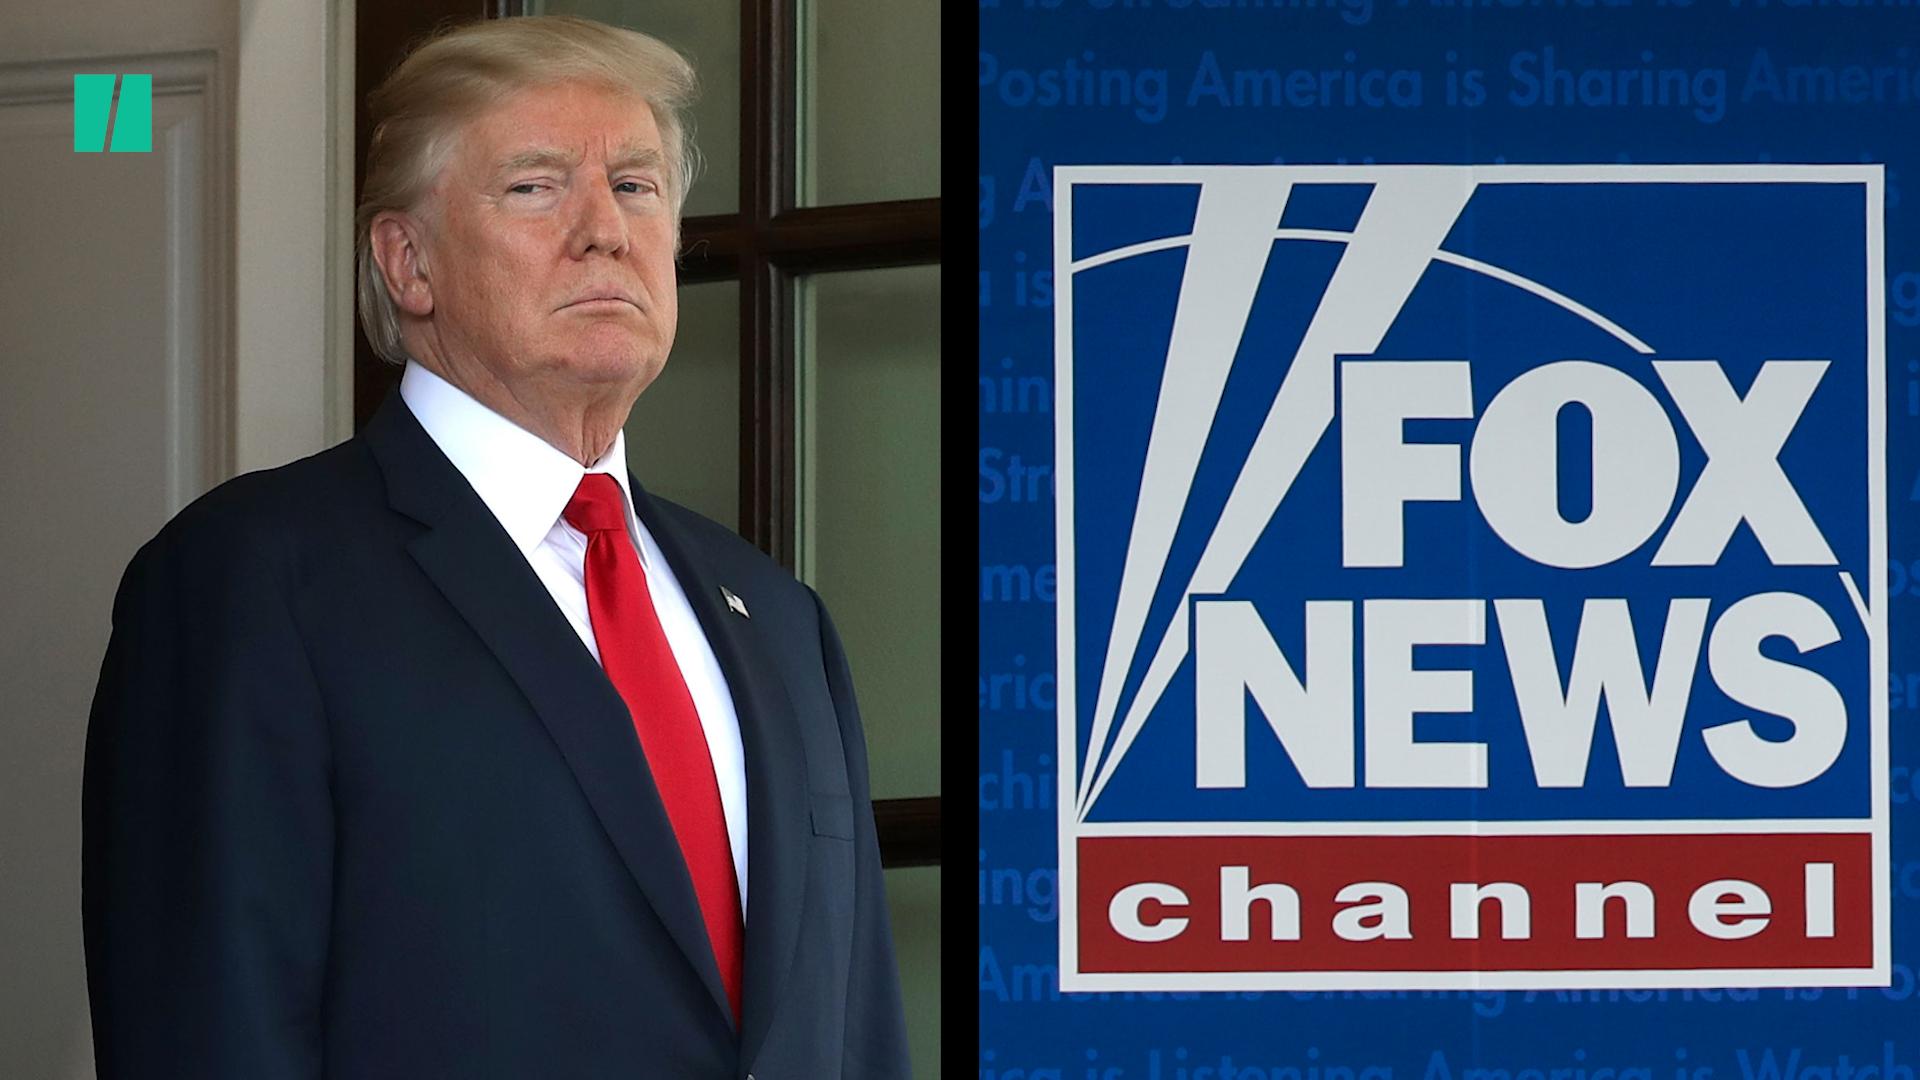 Donald Trump Escalates Attacks On Fox News After Impeachment Poll